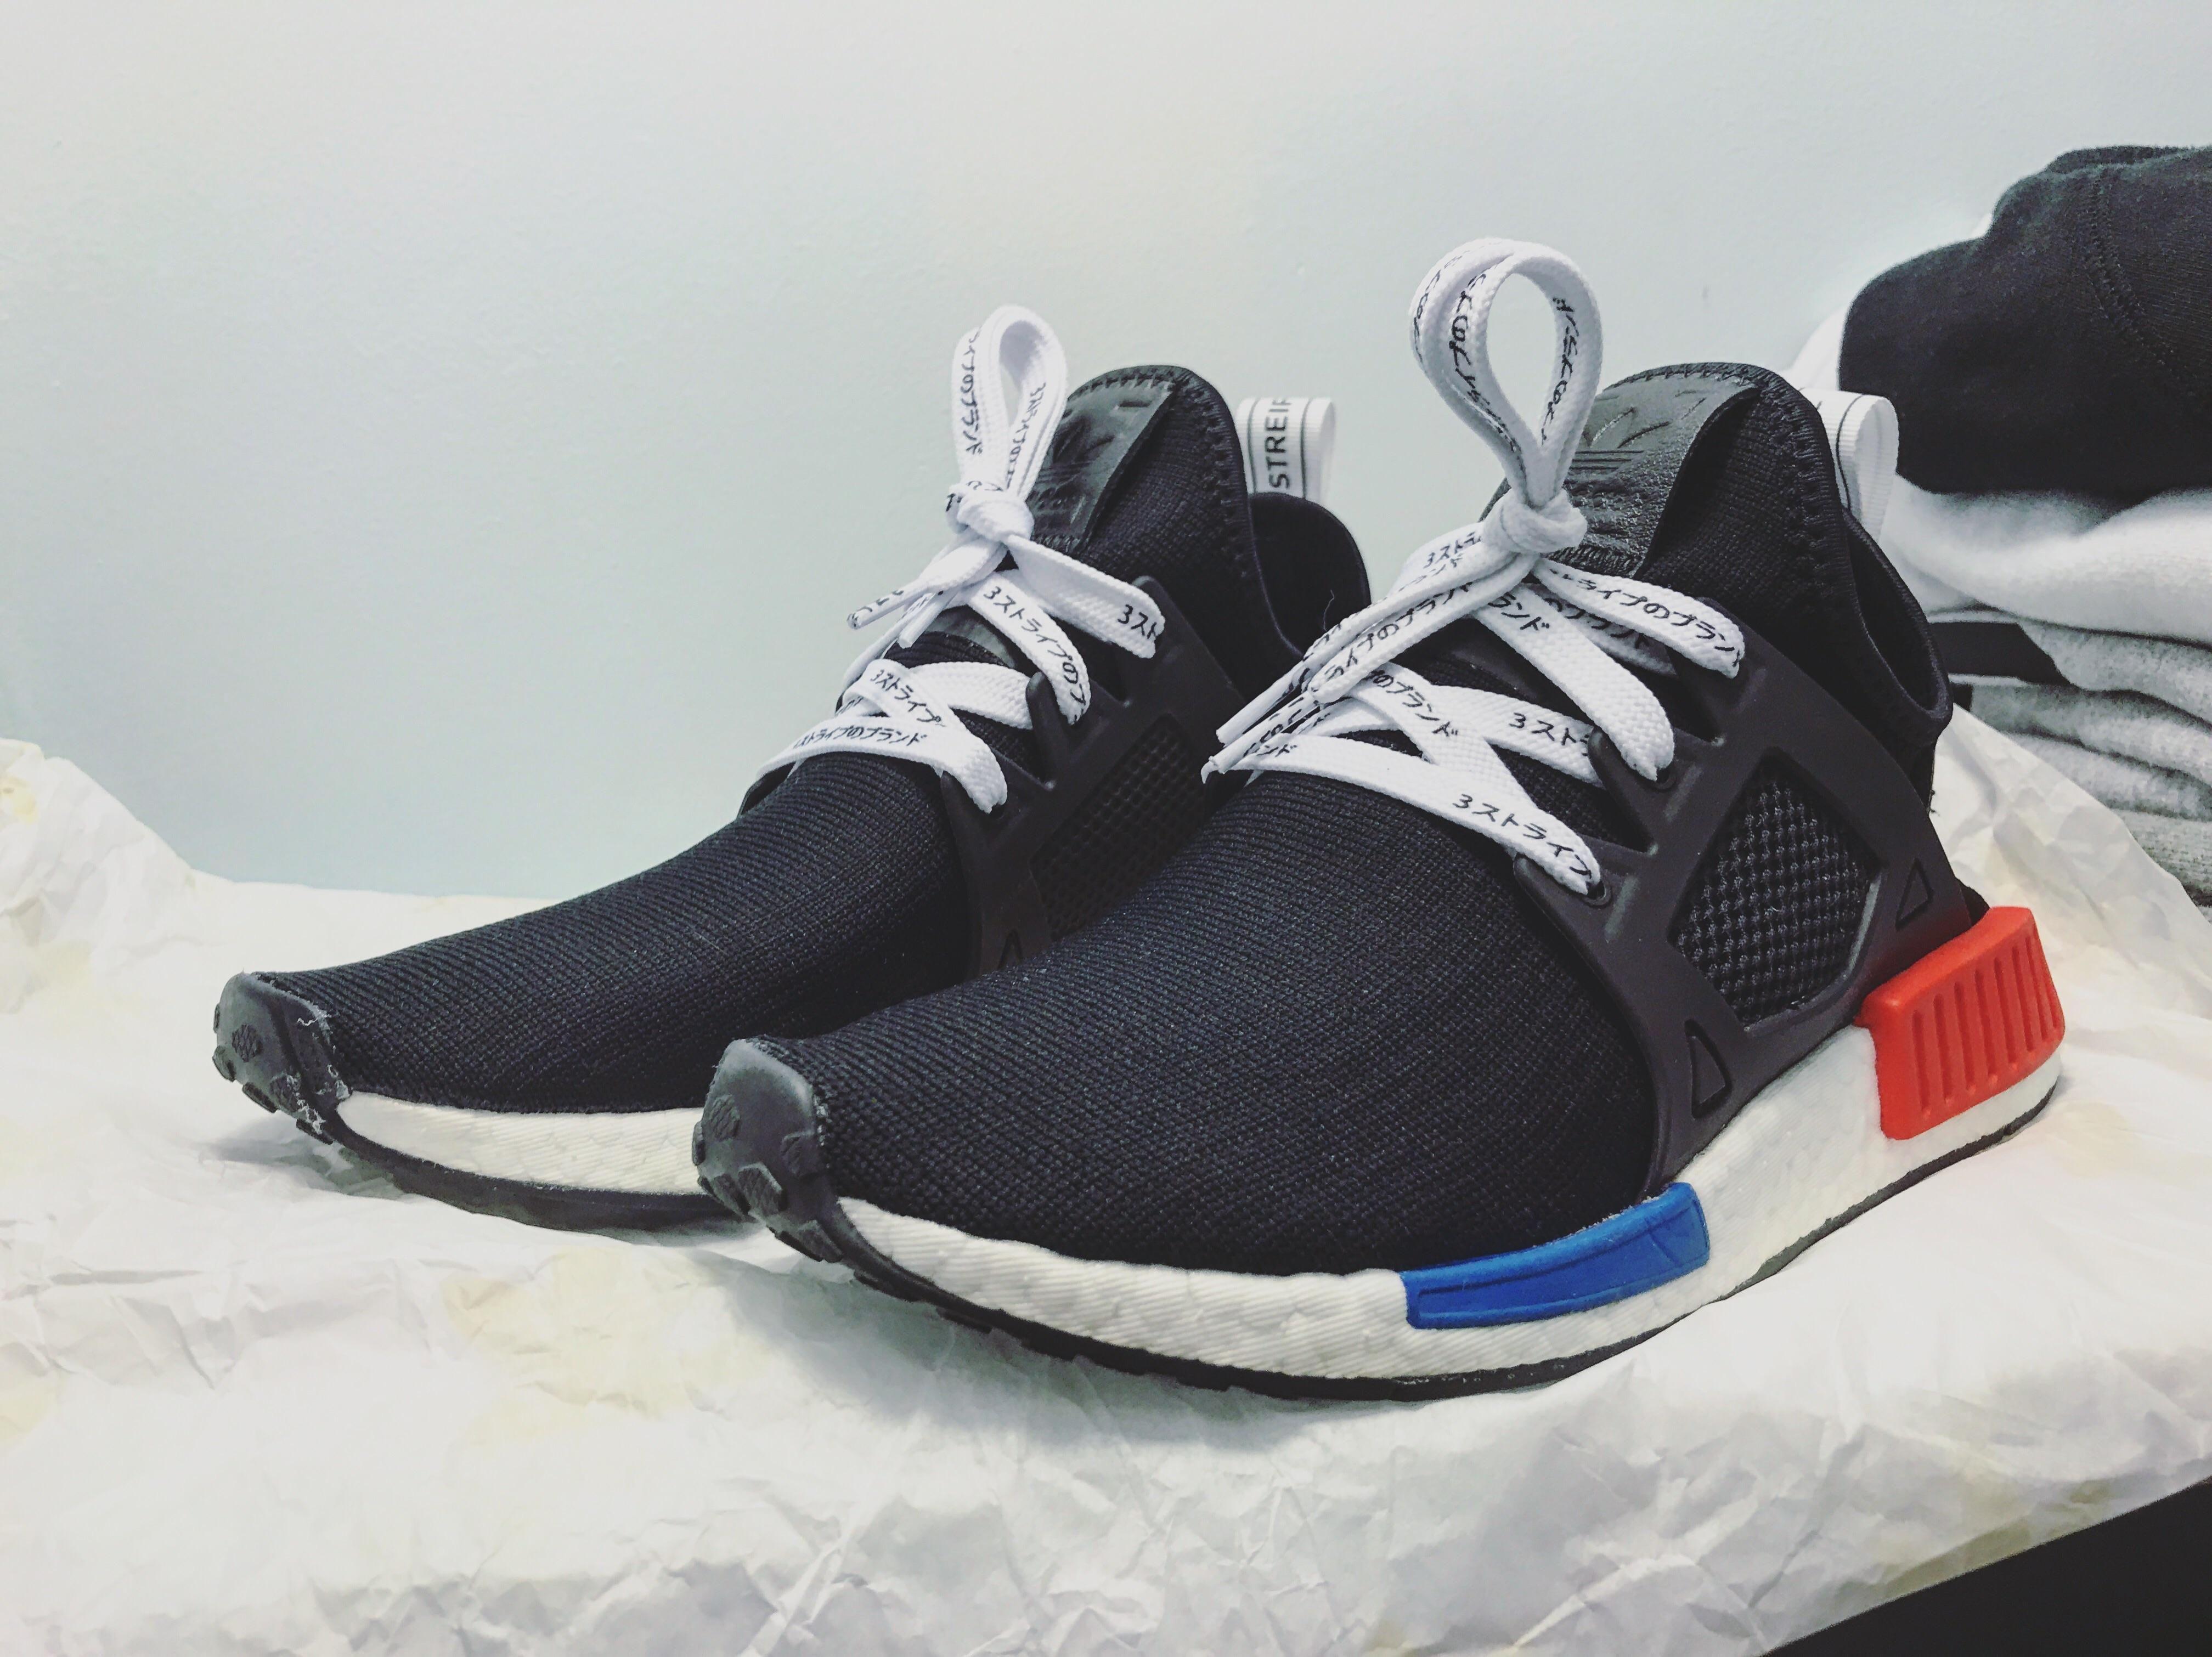 Katakana Lace X Og Nmd Xr1 Adidas Sneakers Sneakers Nmd Xr1